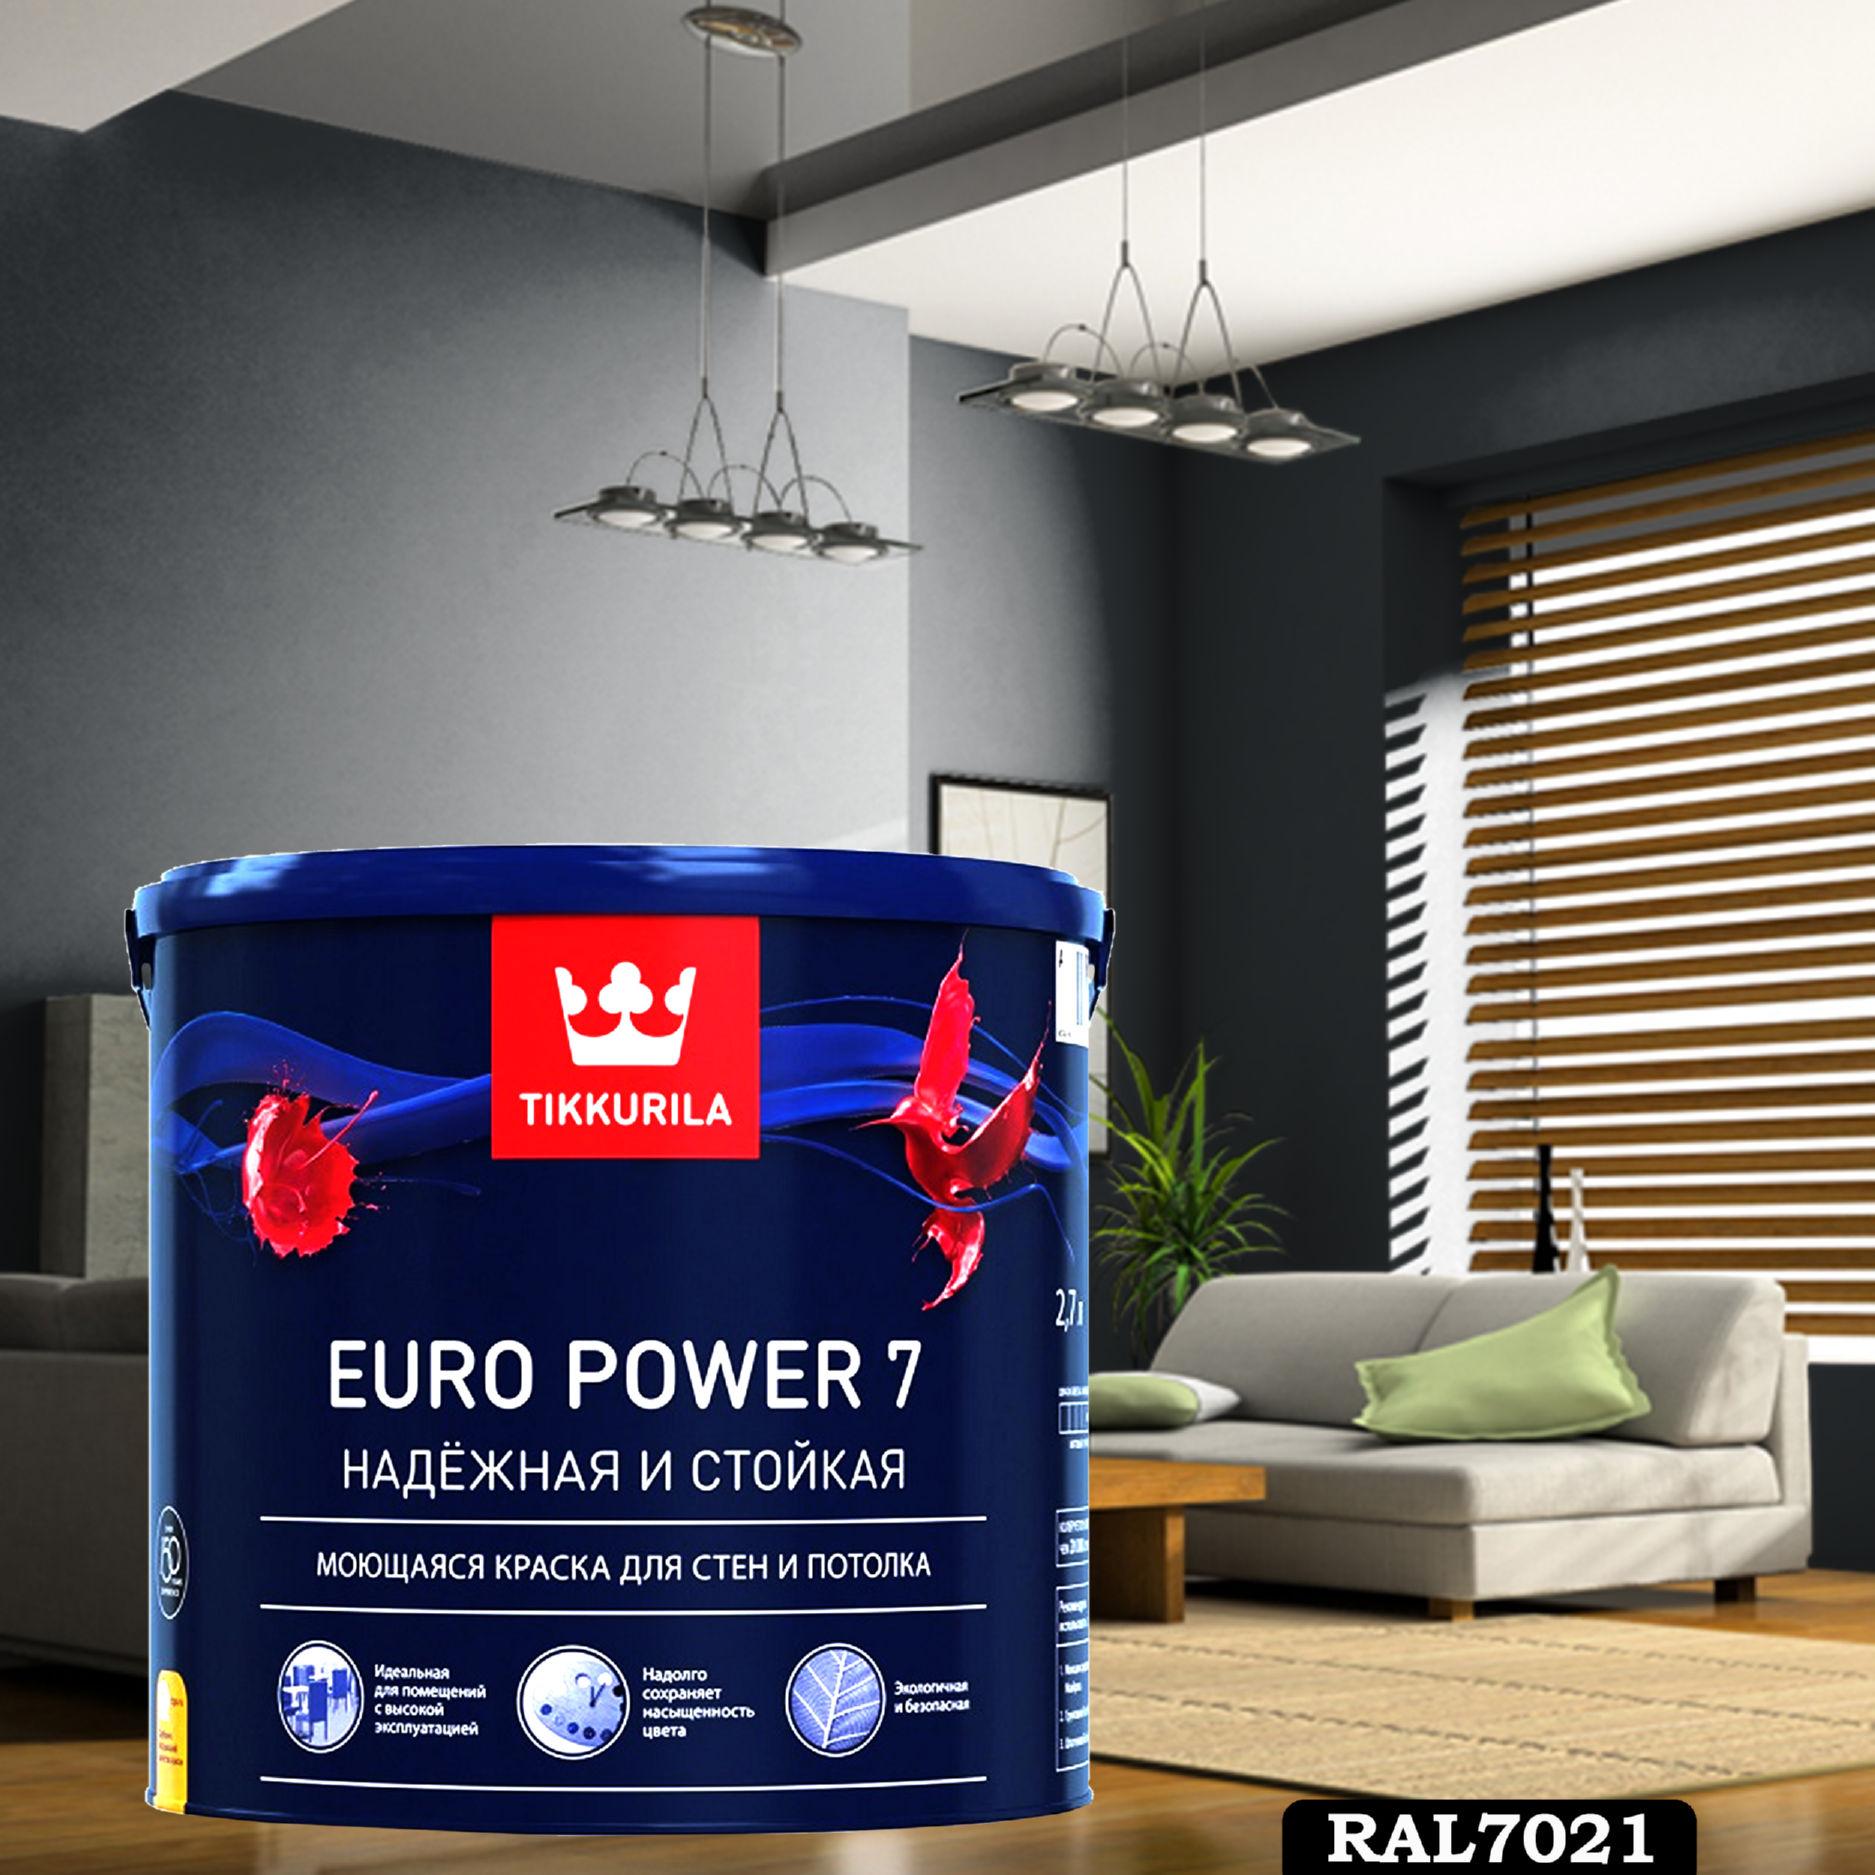 Фото 16 - Краска TIKKURILA Euro Power 7,  RAL 7021 Чёрно-серый, латексная моющаяся матовая интерьерная, 9 л.